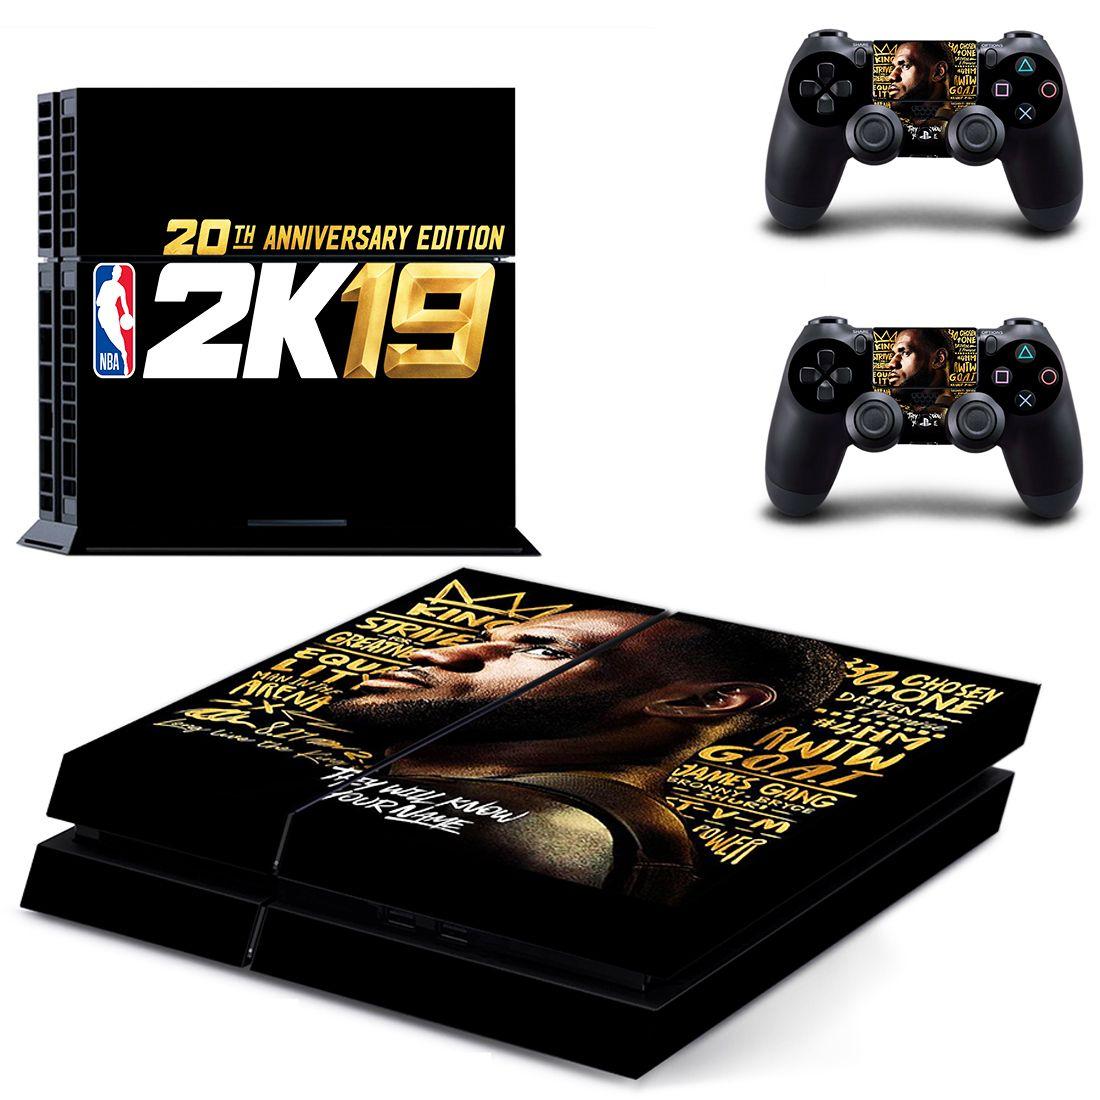 NBA 2K19 Playstation PS4 Pro Skin Stickers Free Shipping – DjTrading ... 81d006d40c4